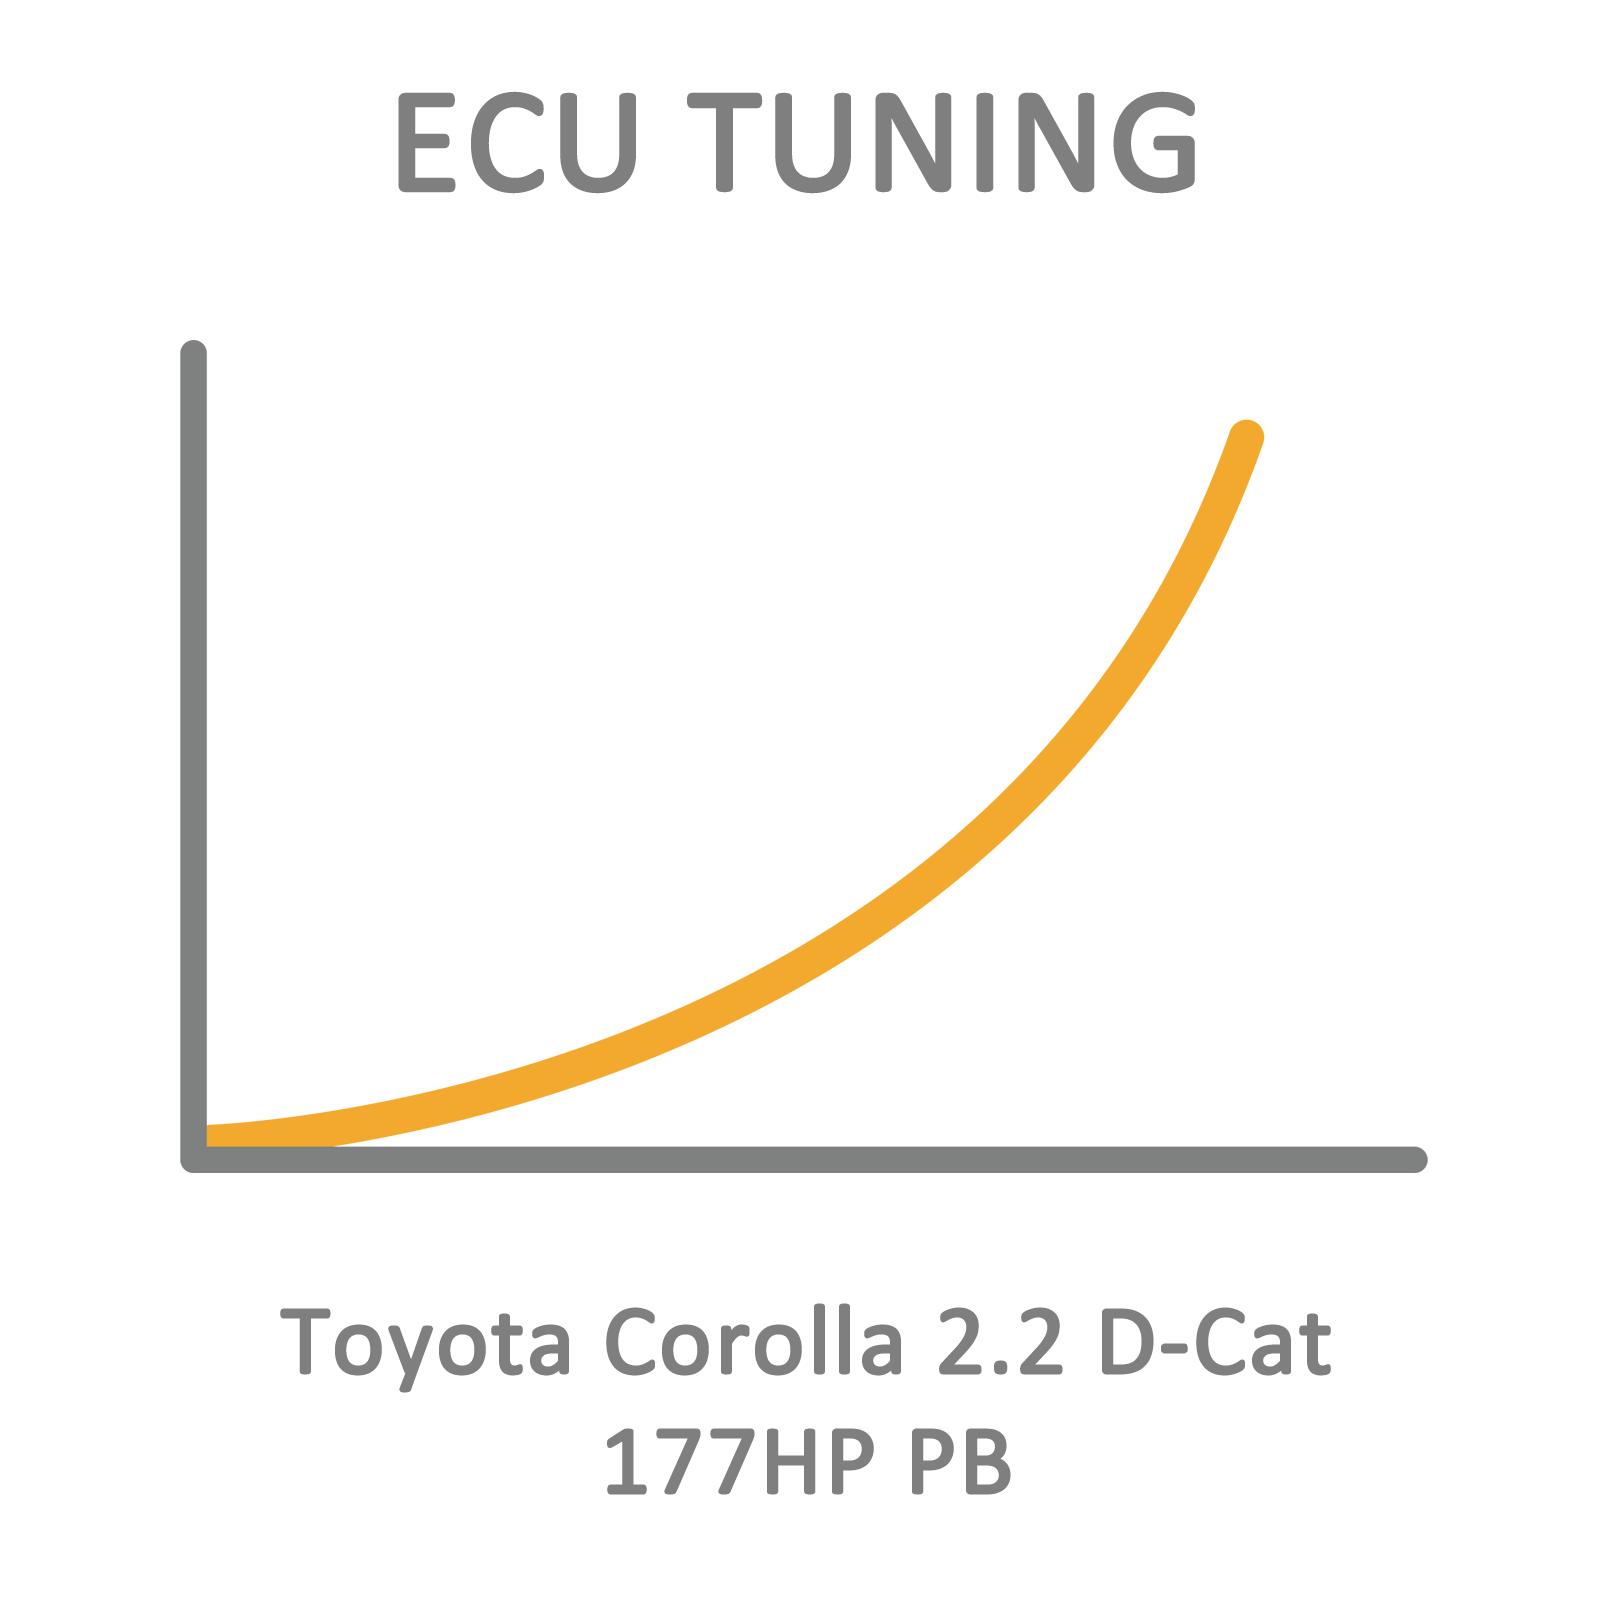 Toyota Corolla 2.2 D-Cat 177HP PB ECU Tuning Remapping